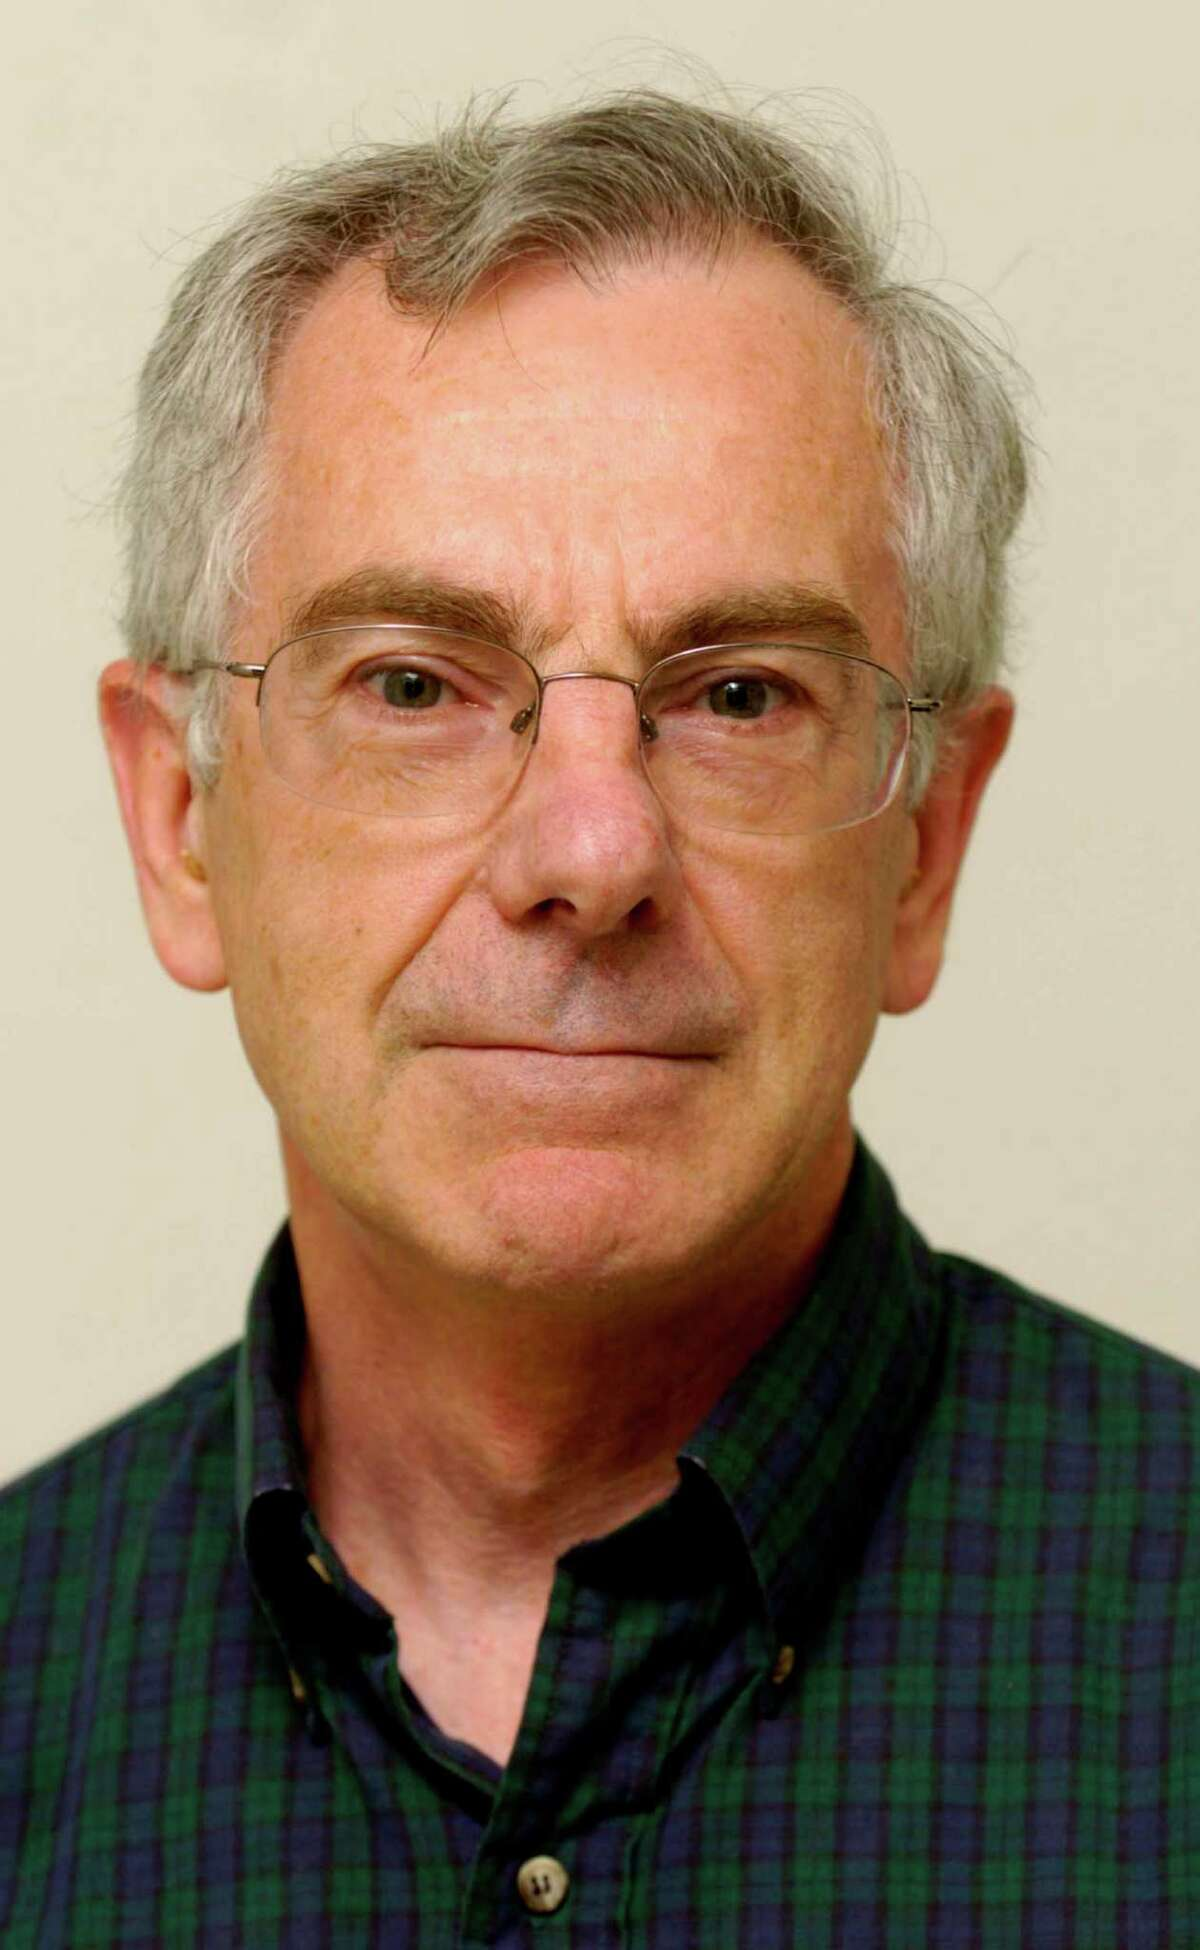 Denis (sic) Bouffard for forum on faith.